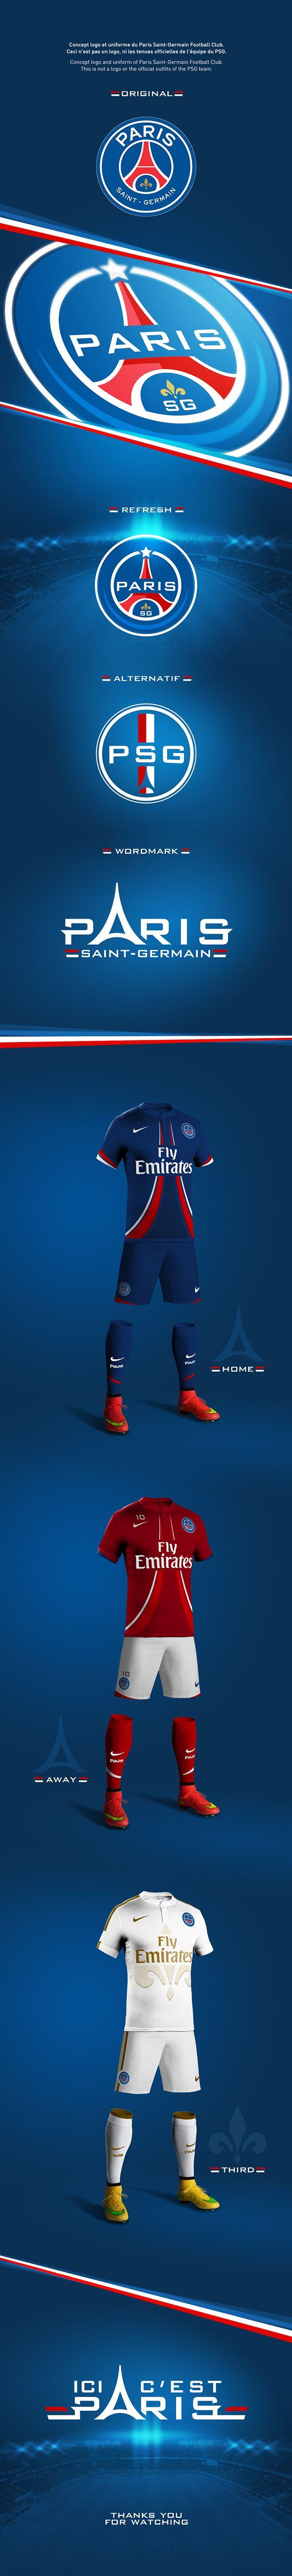 Graphic Design // Branding // Concept rebrand PSG football club on Behance